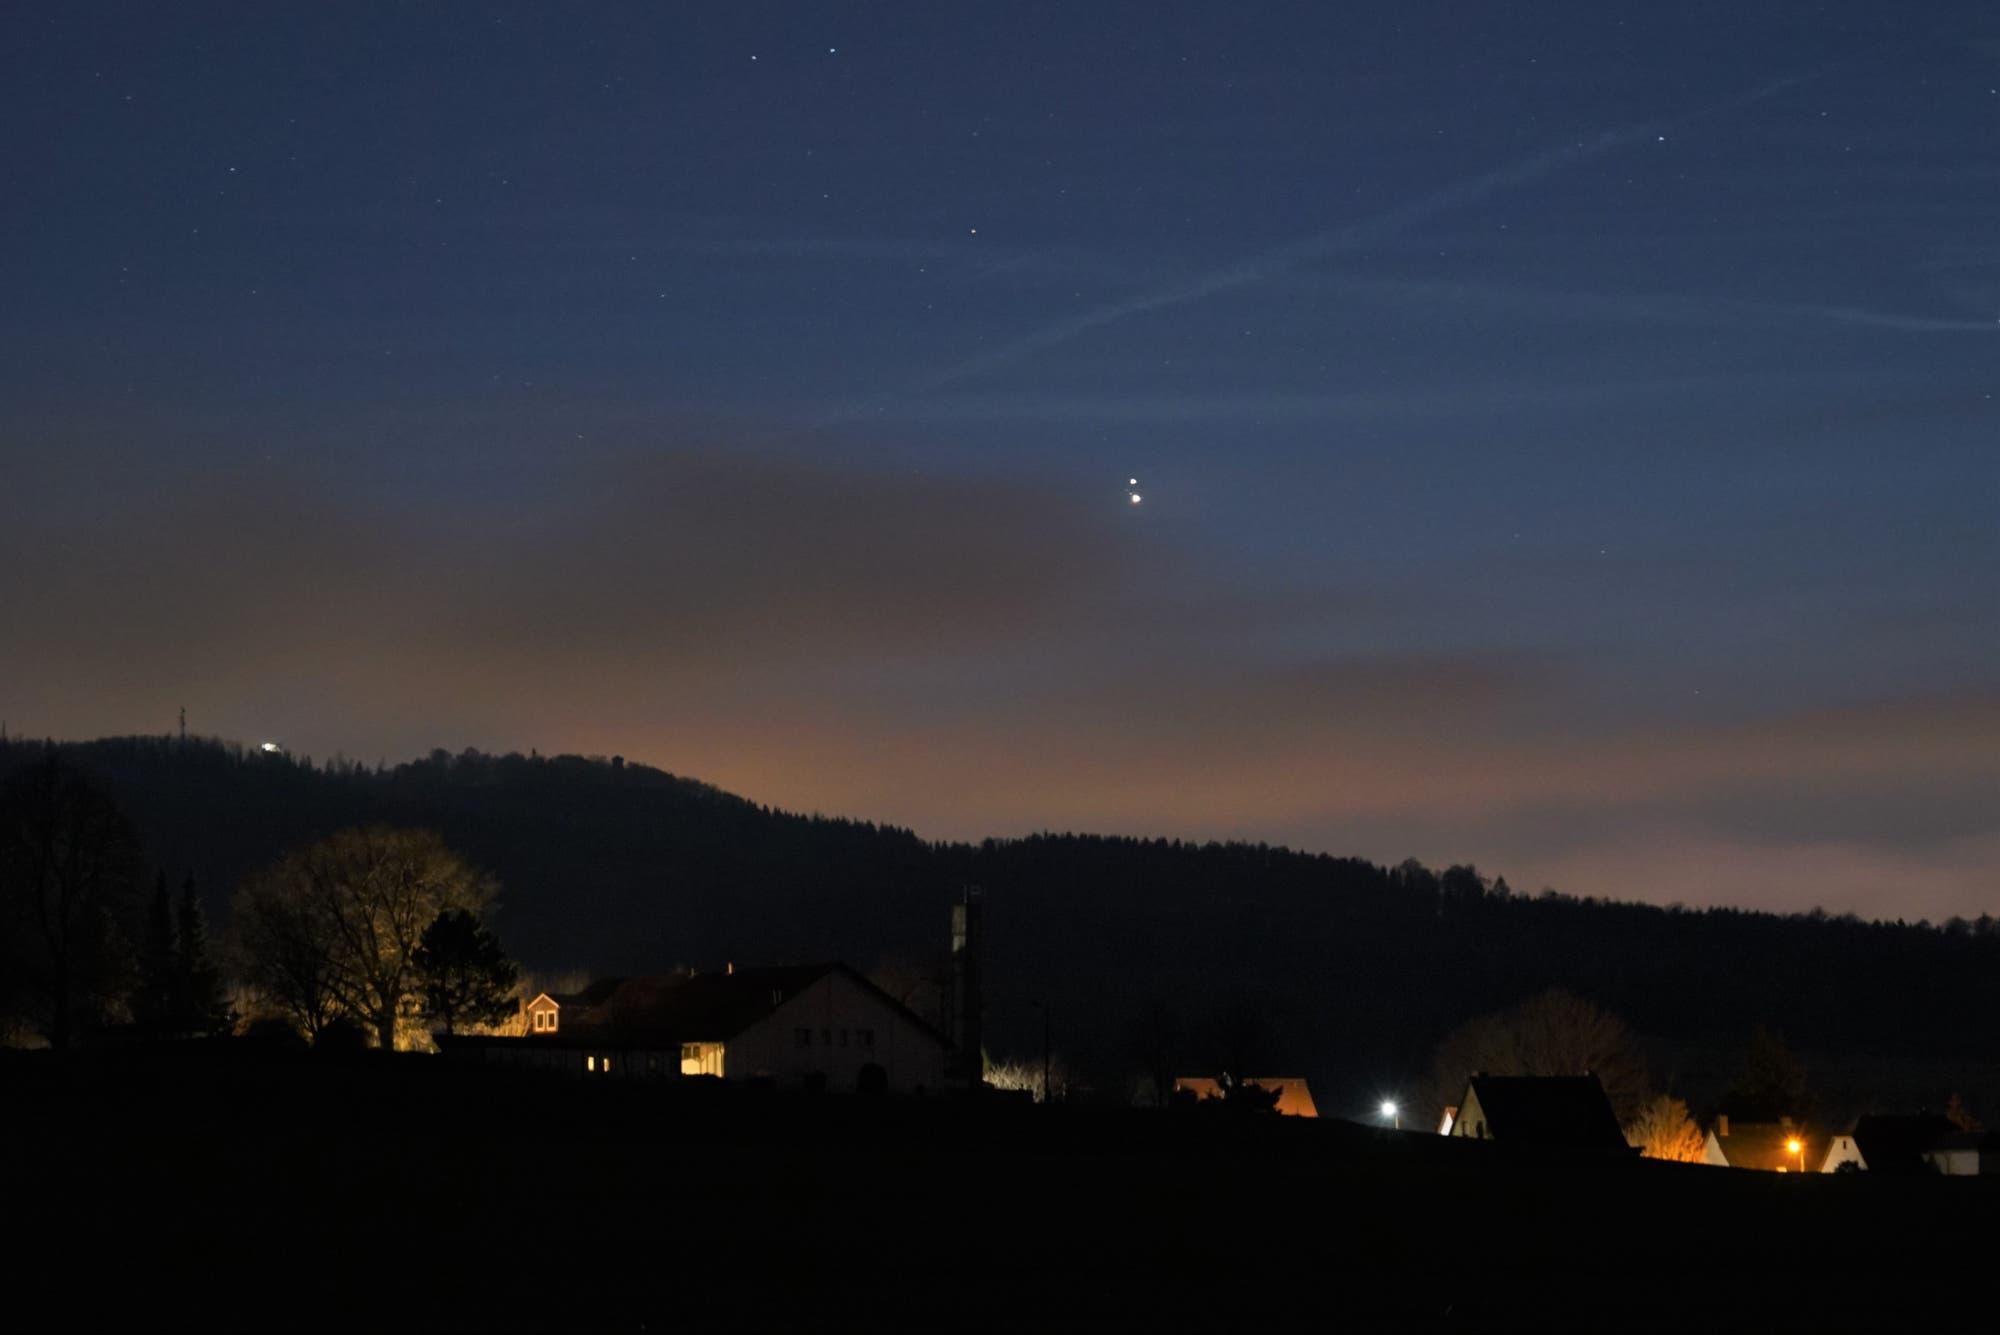 Jupiter/Saturn über Obercunnersdorf